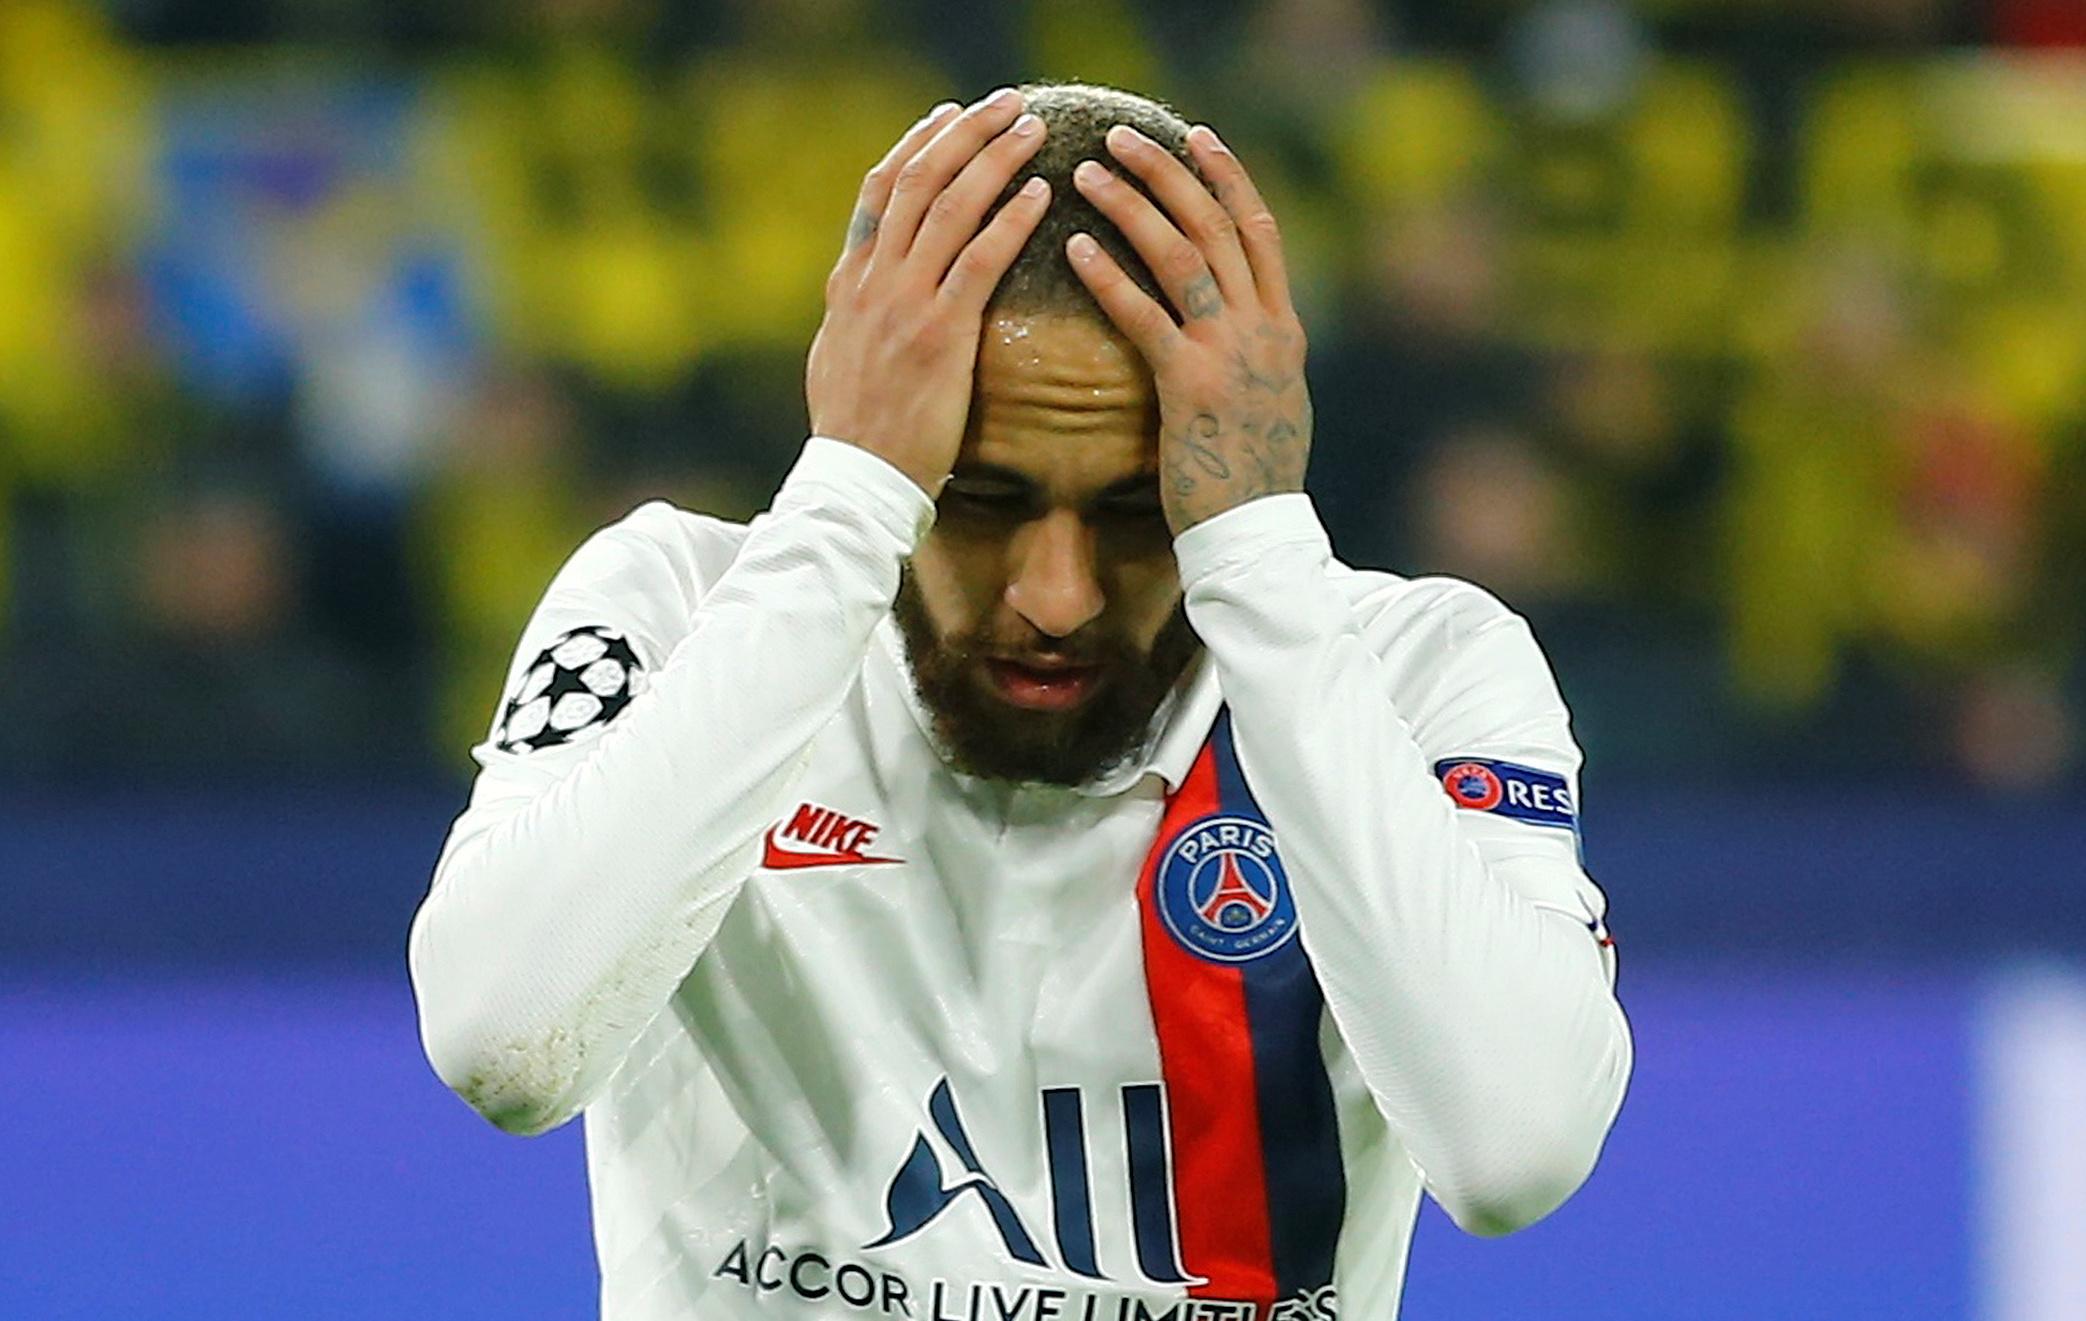 Football - Ligue des champions - Dortmund-PSG : On attendait Neymar... et on l'attend encore